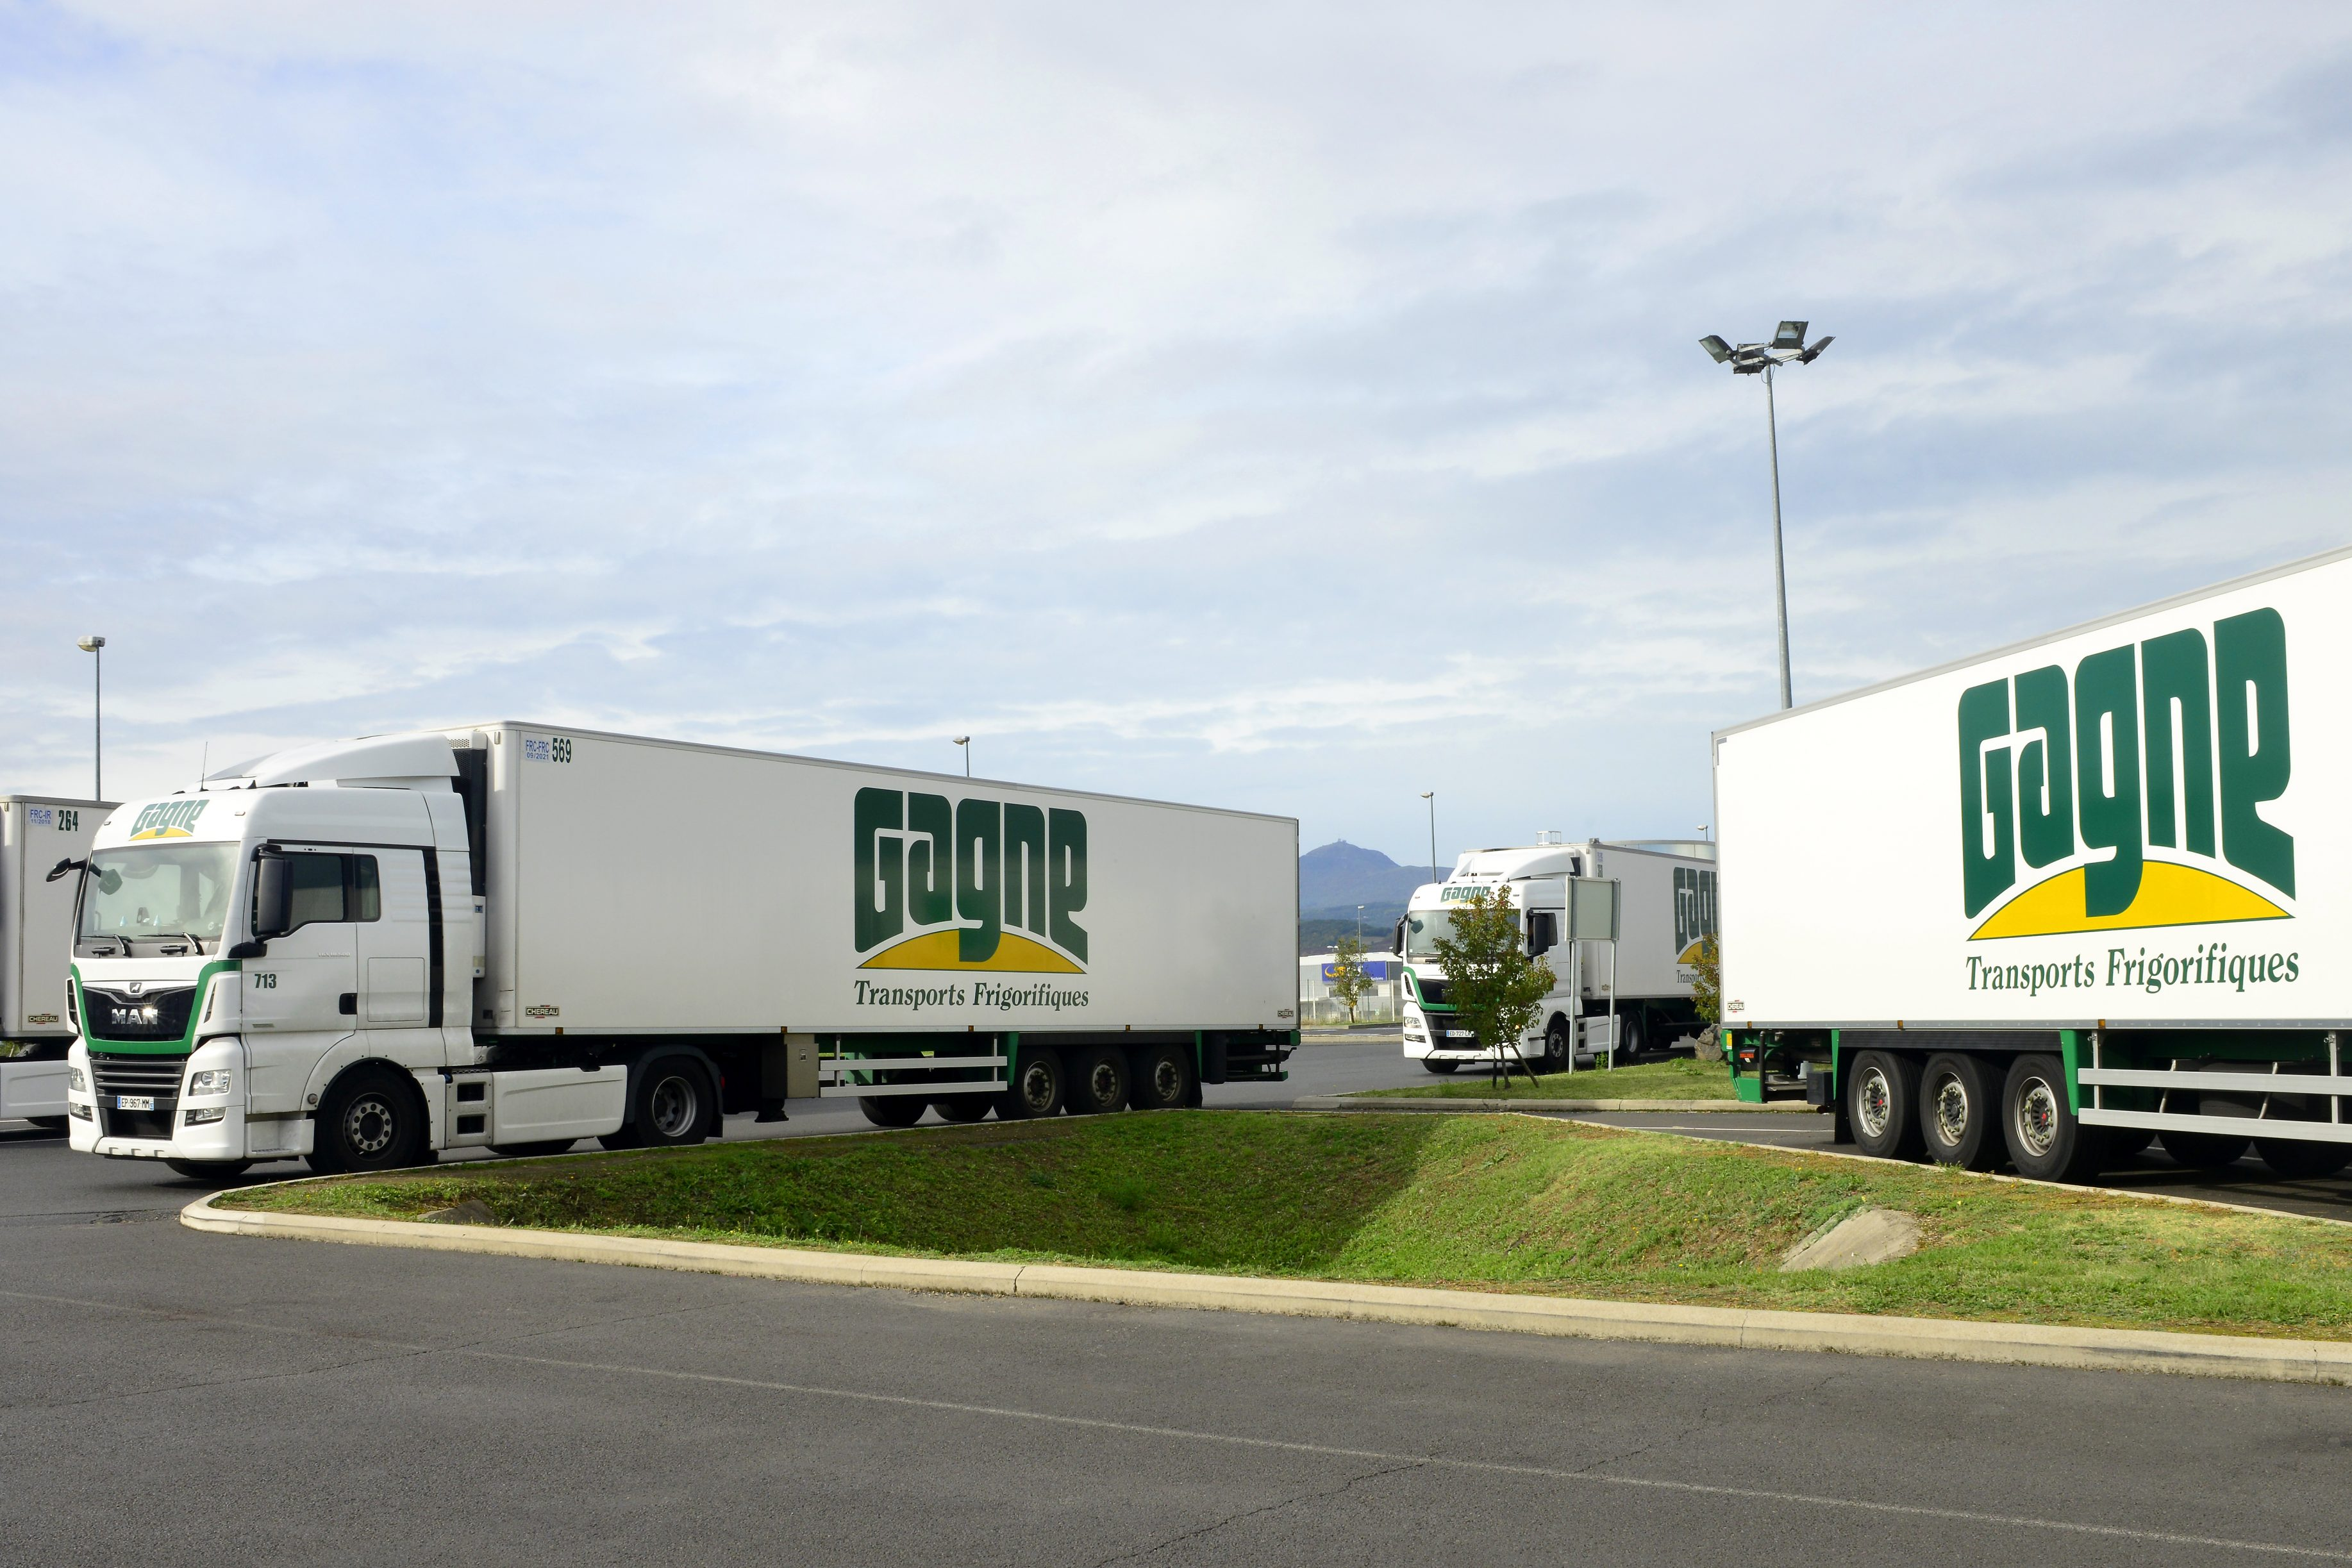 Transports Frigorifiques Rhône-Alpes